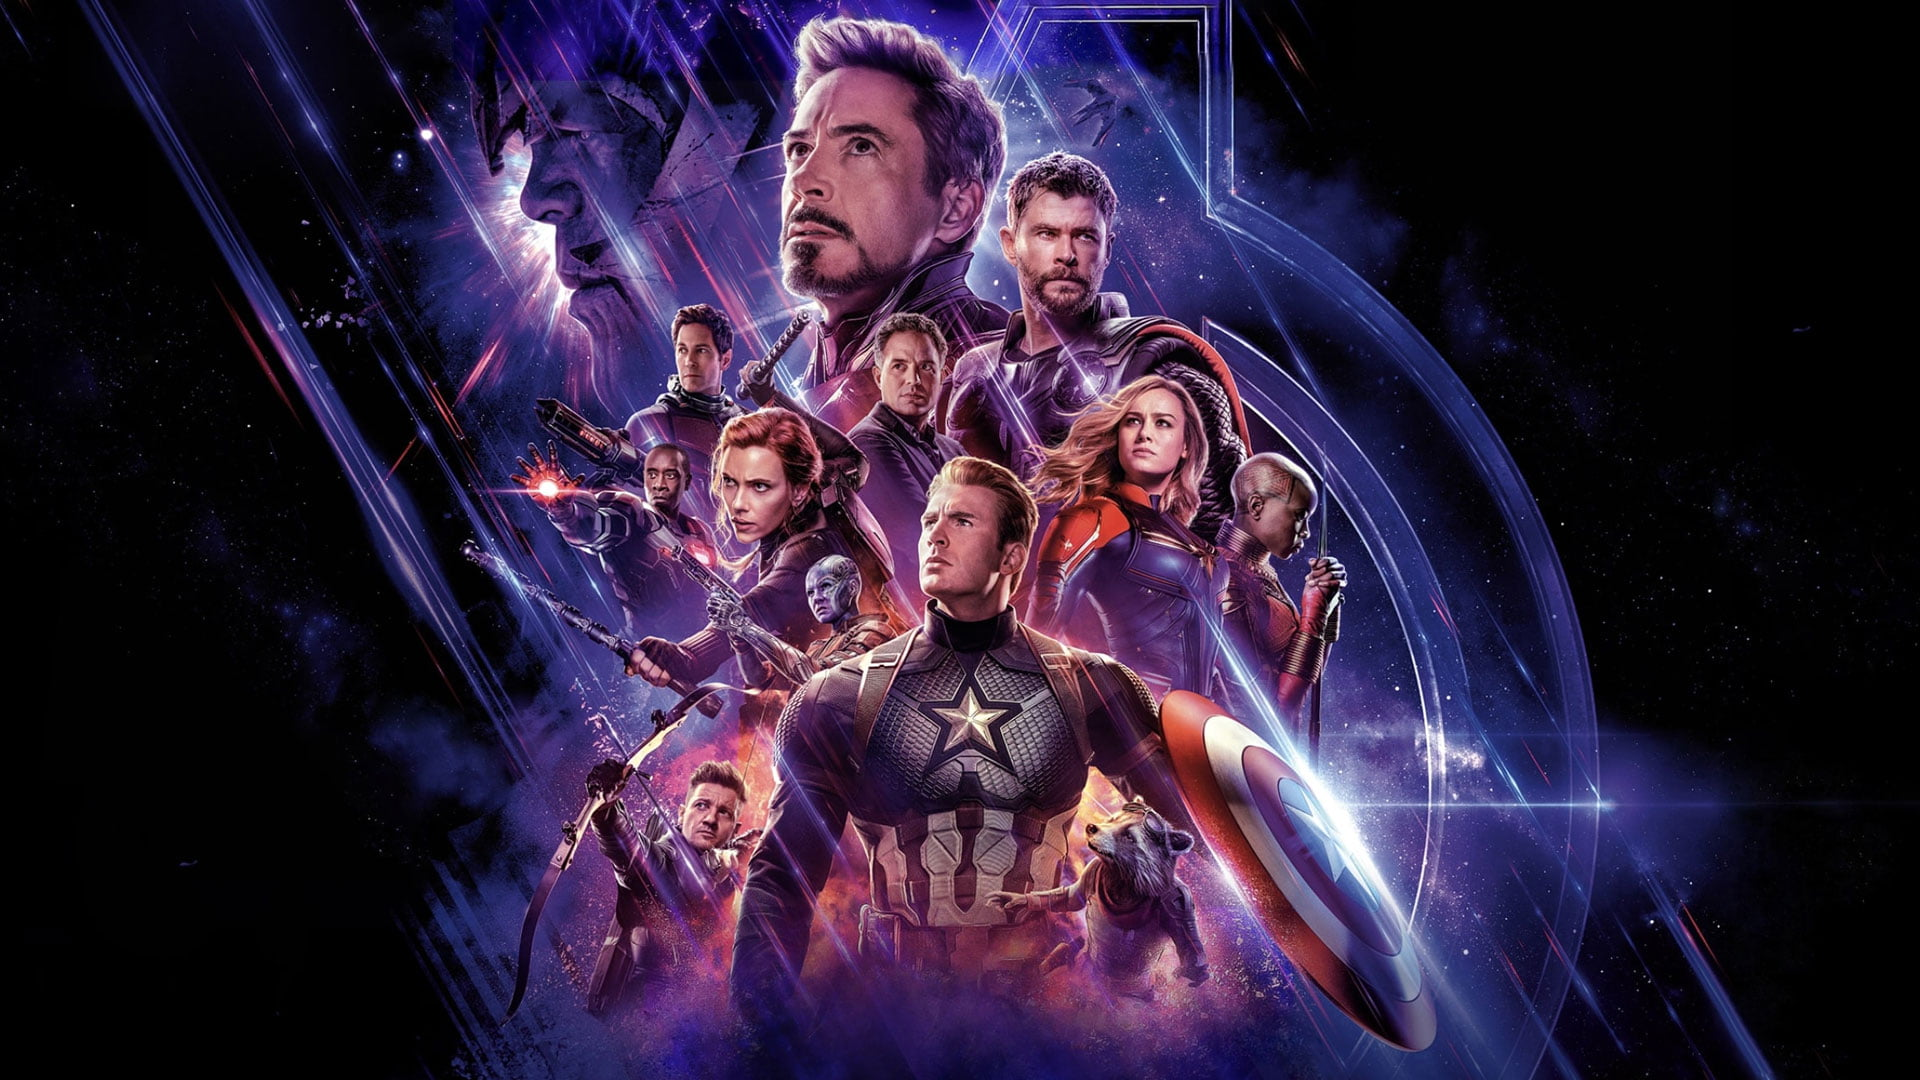 Огляд фільму «Месники: Завершення», яке ми (не) заслужили / The Avengers: Endgame (2019)